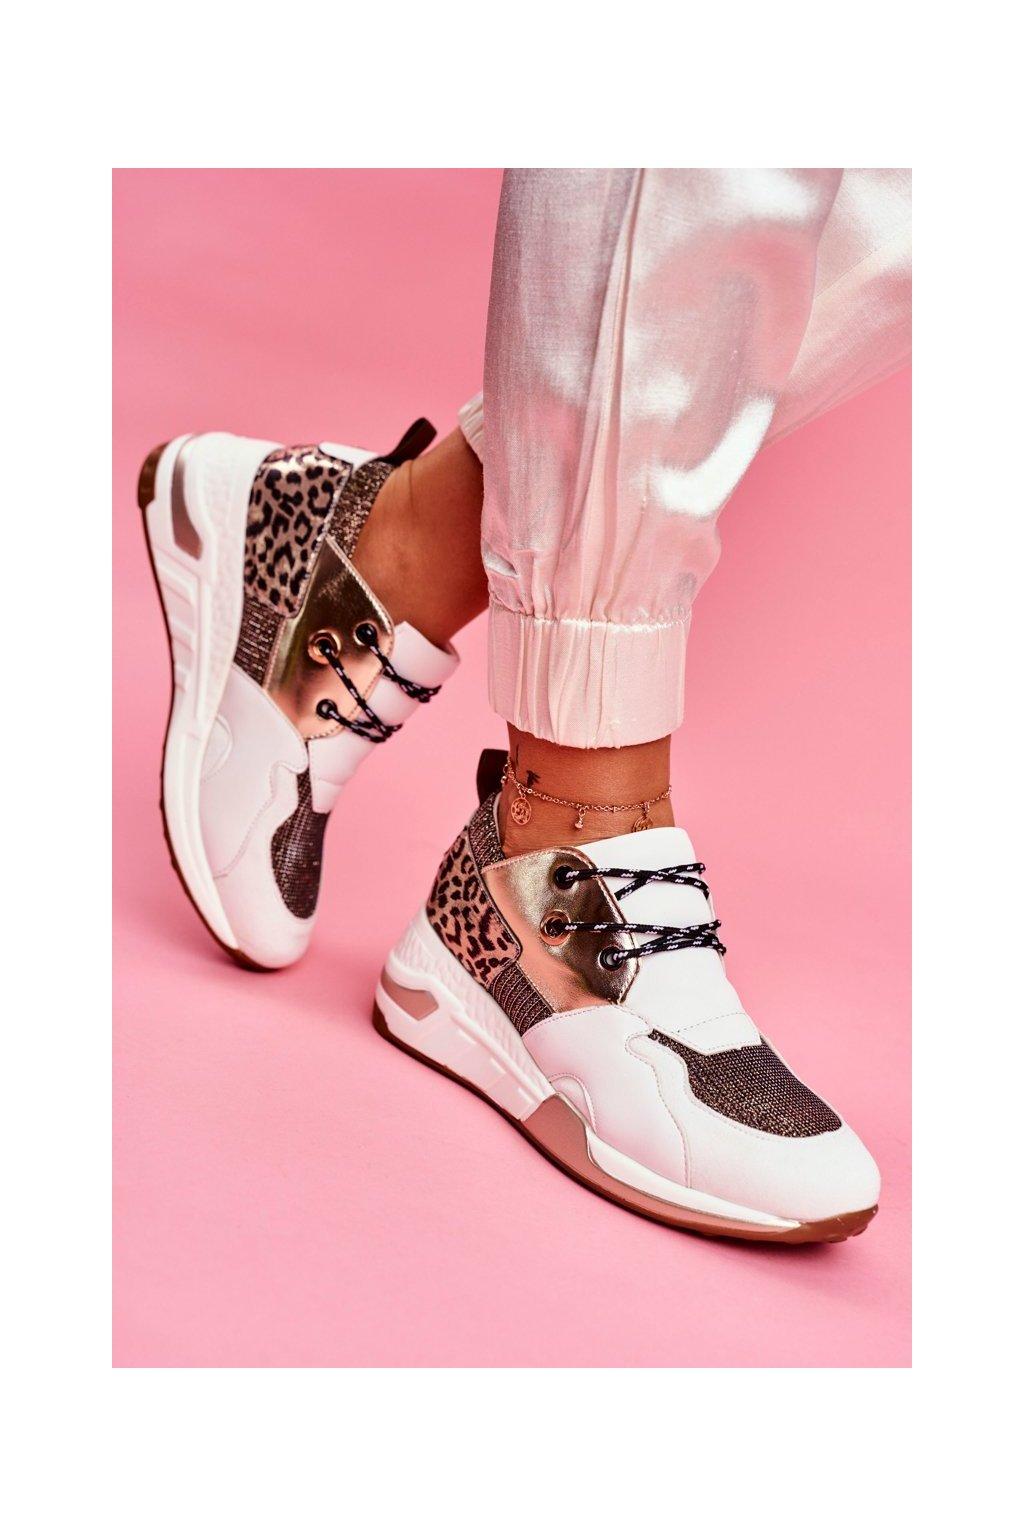 Dámska športová obuv biele zlato Sempre